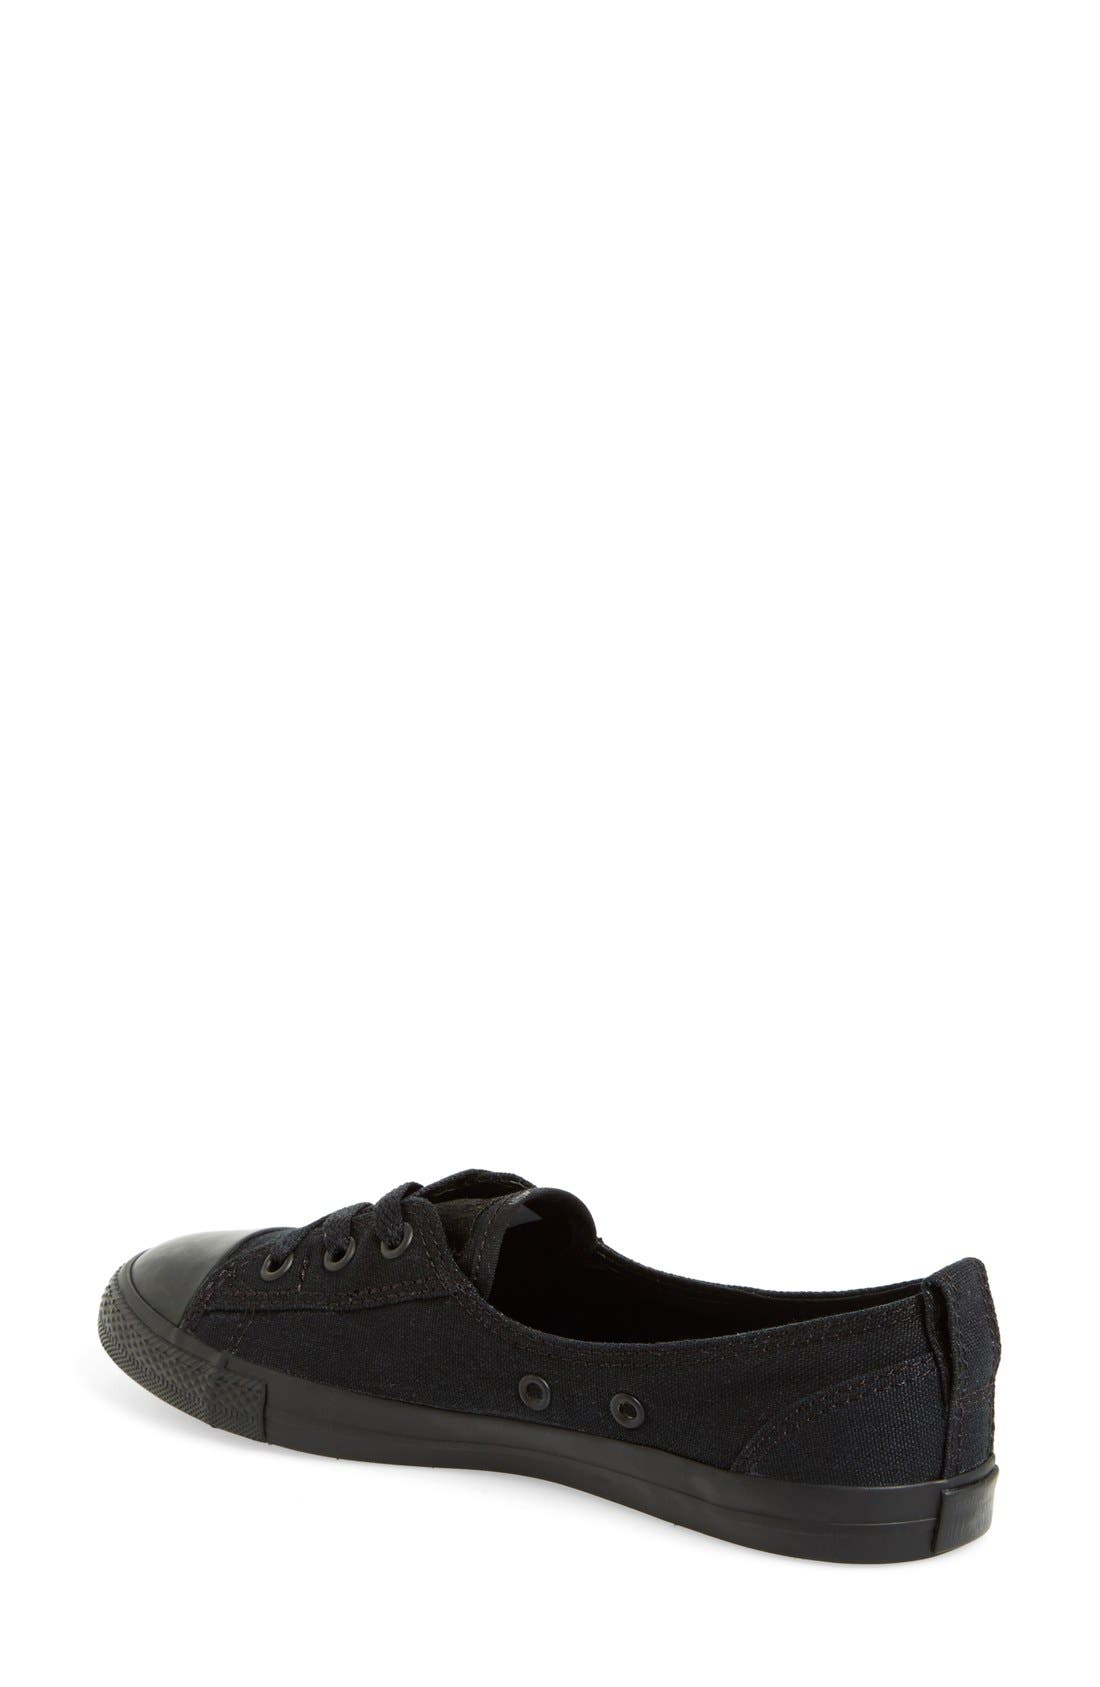 Alternate Image 2  - Converse Chuck Taylor® All Star® Ballet Canvas Sneaker (Women)